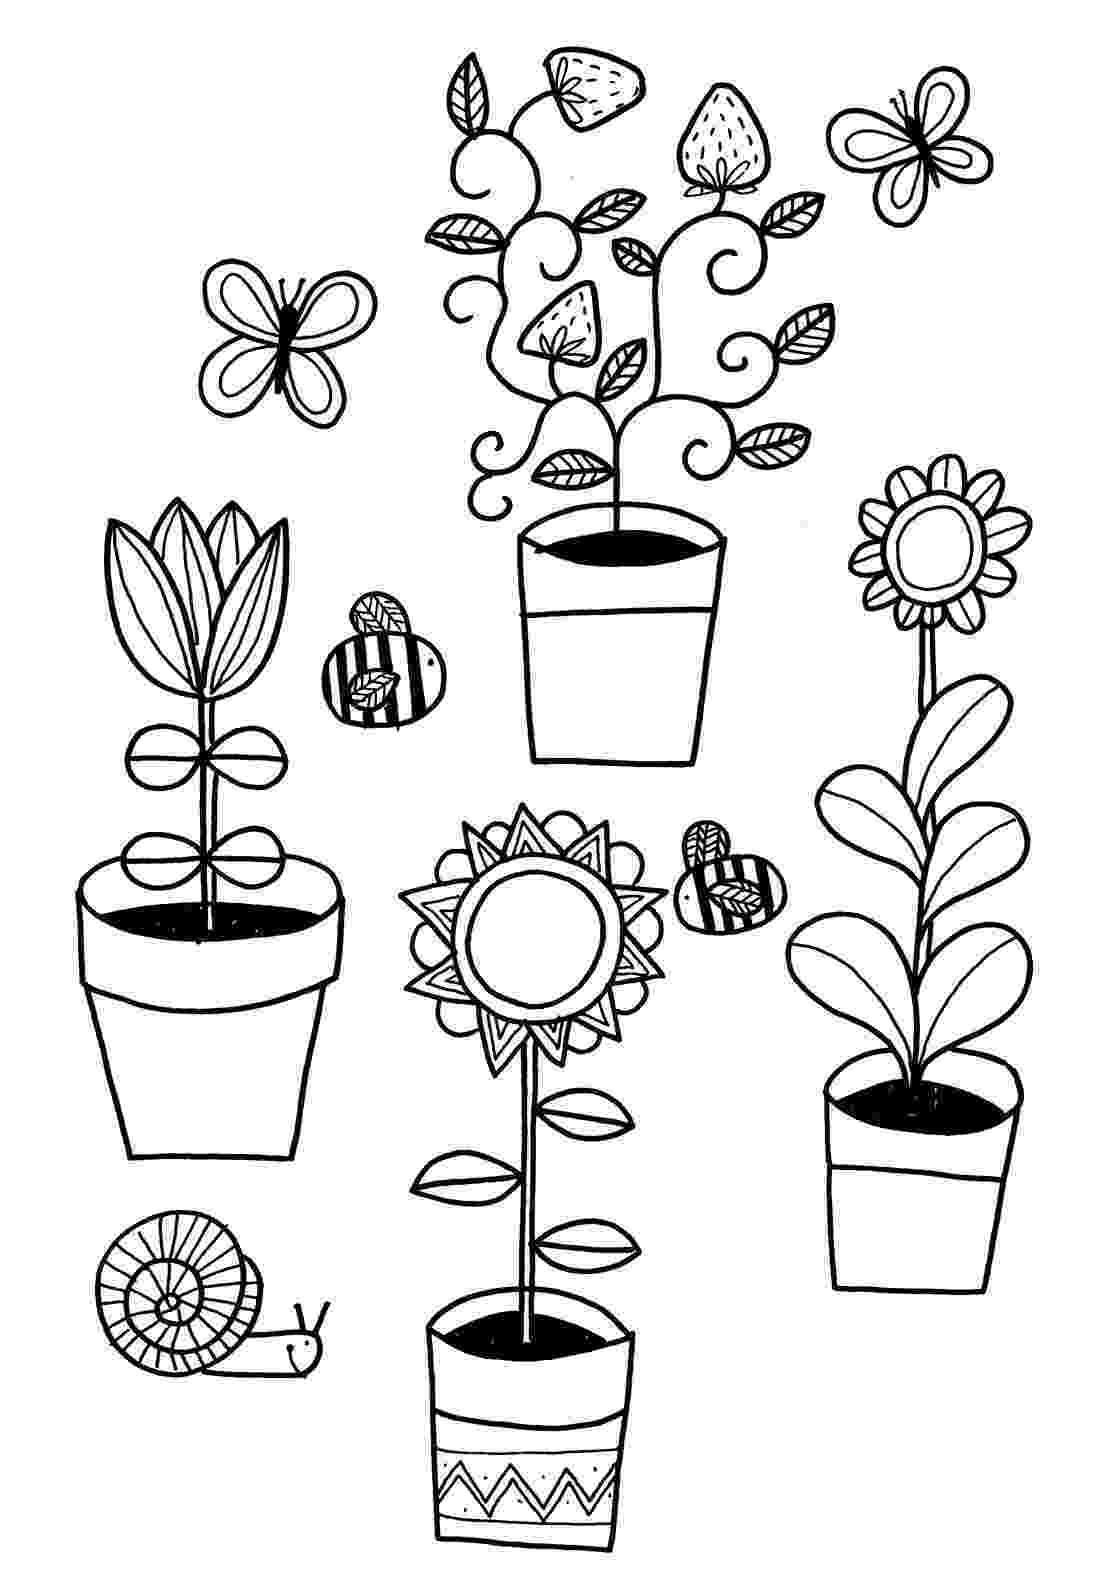 plant colouring sheets tomato plant coloring page free printable coloring pages plant colouring sheets